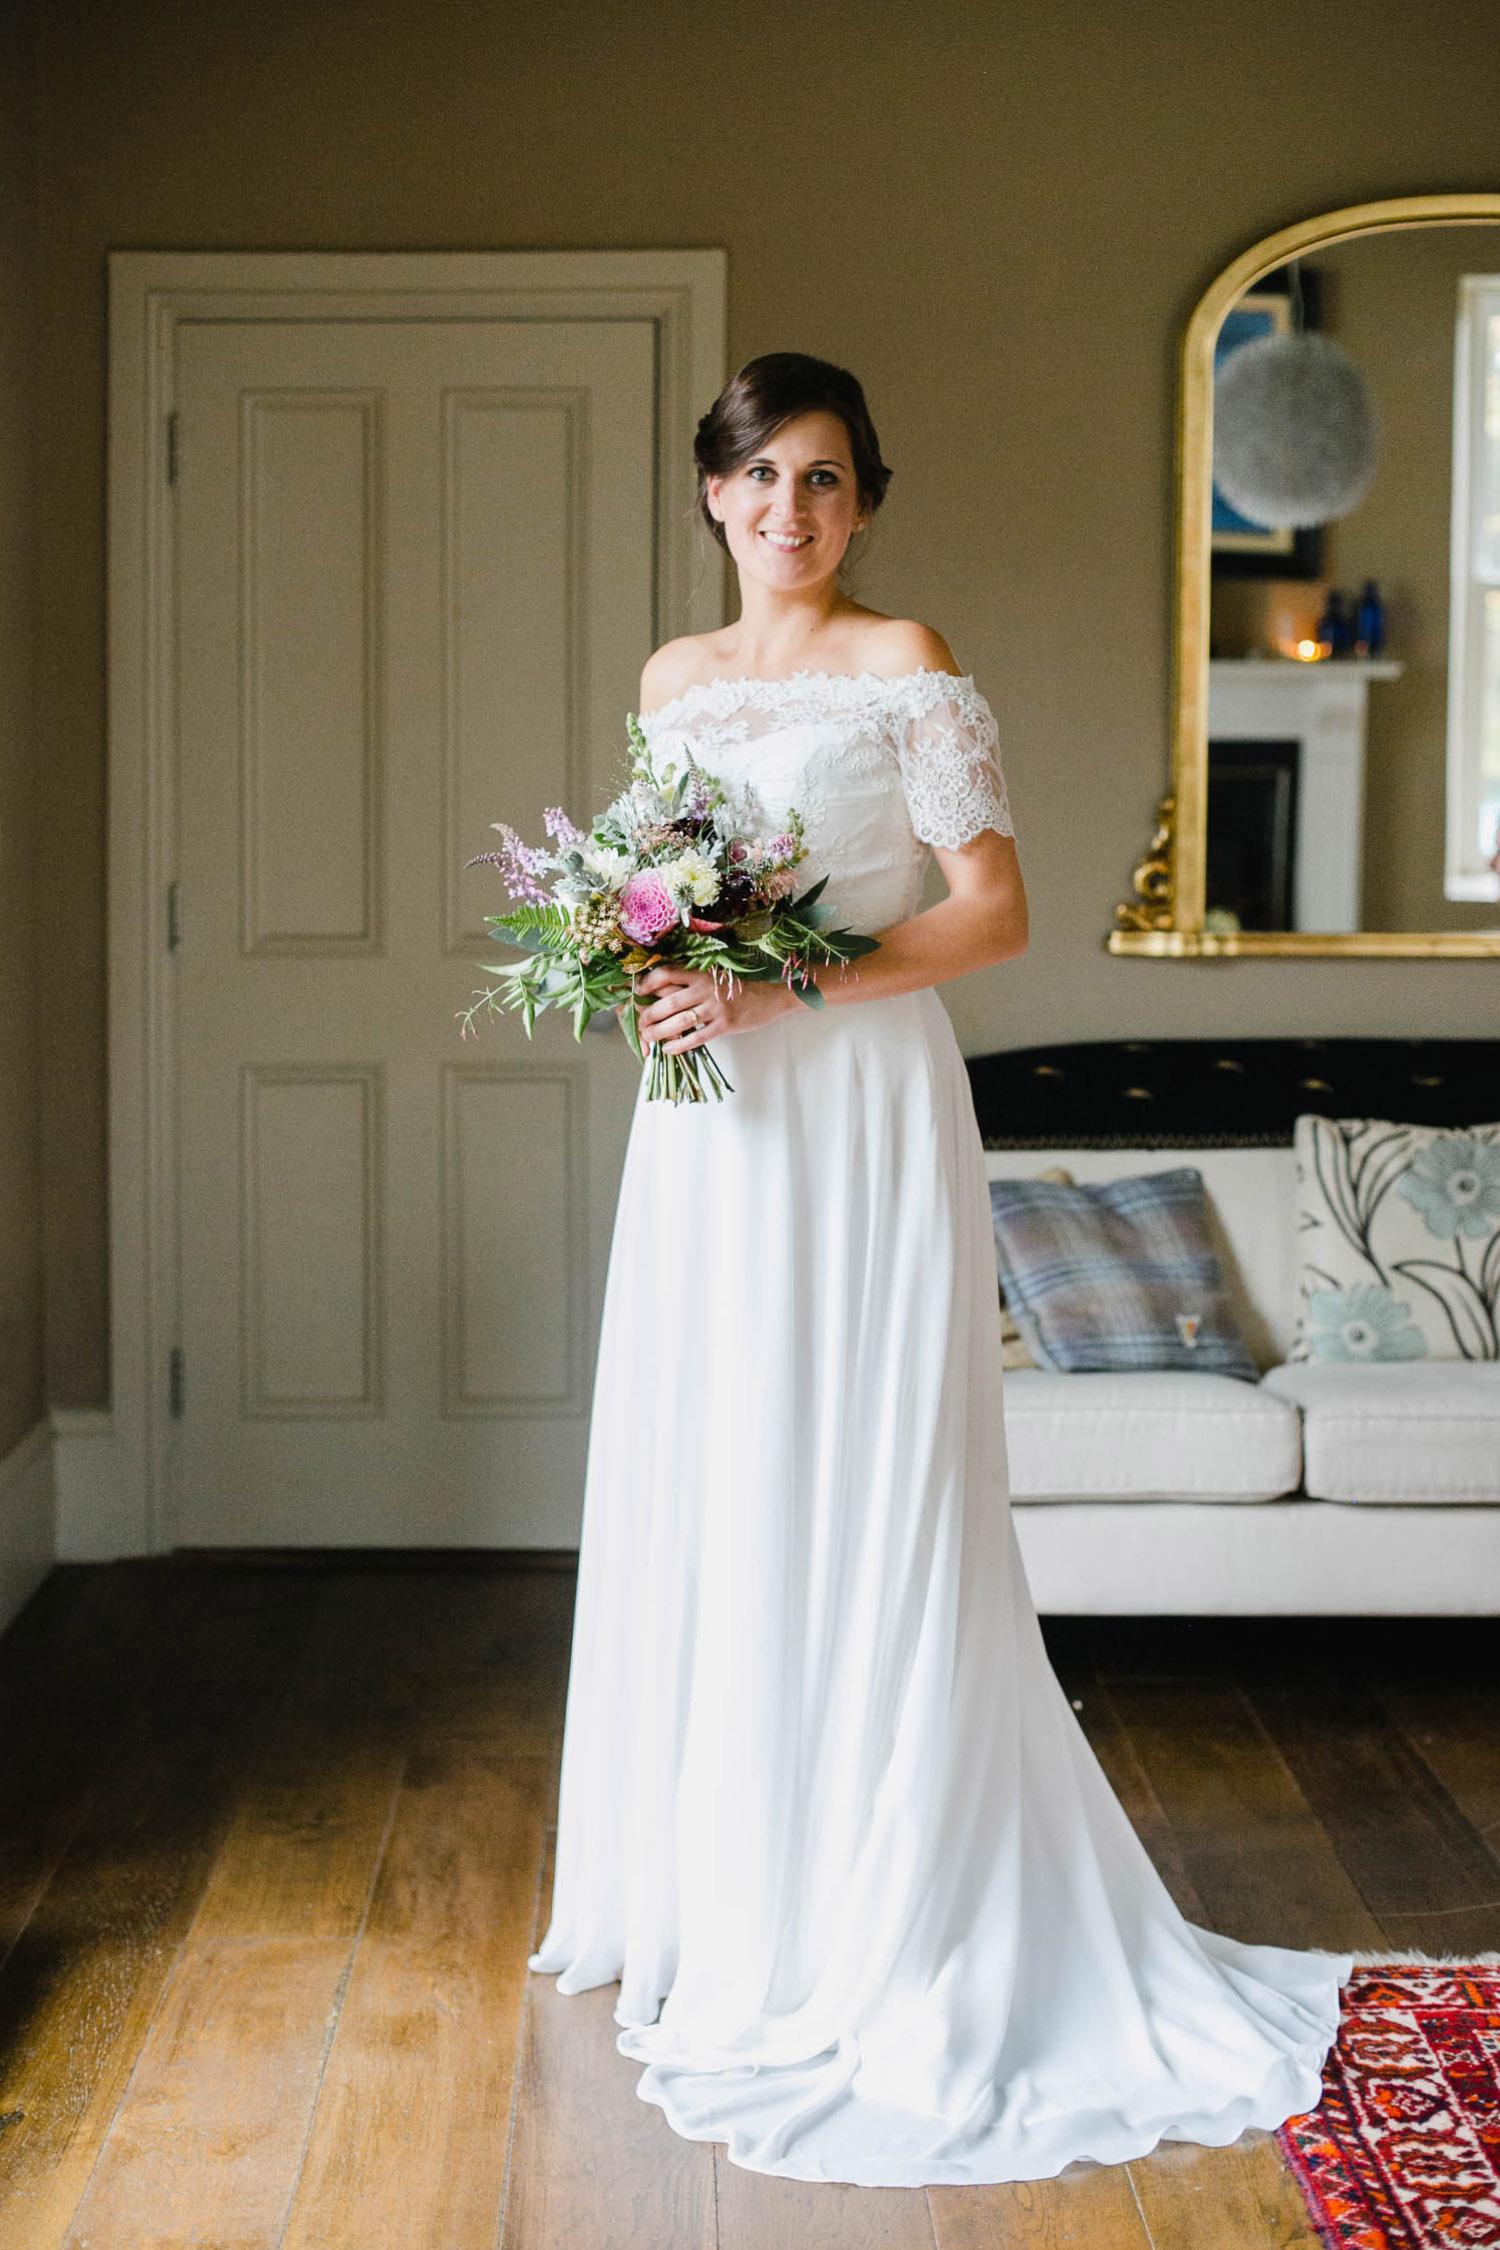 Natural Light Bridal Portrait In Dunowen House